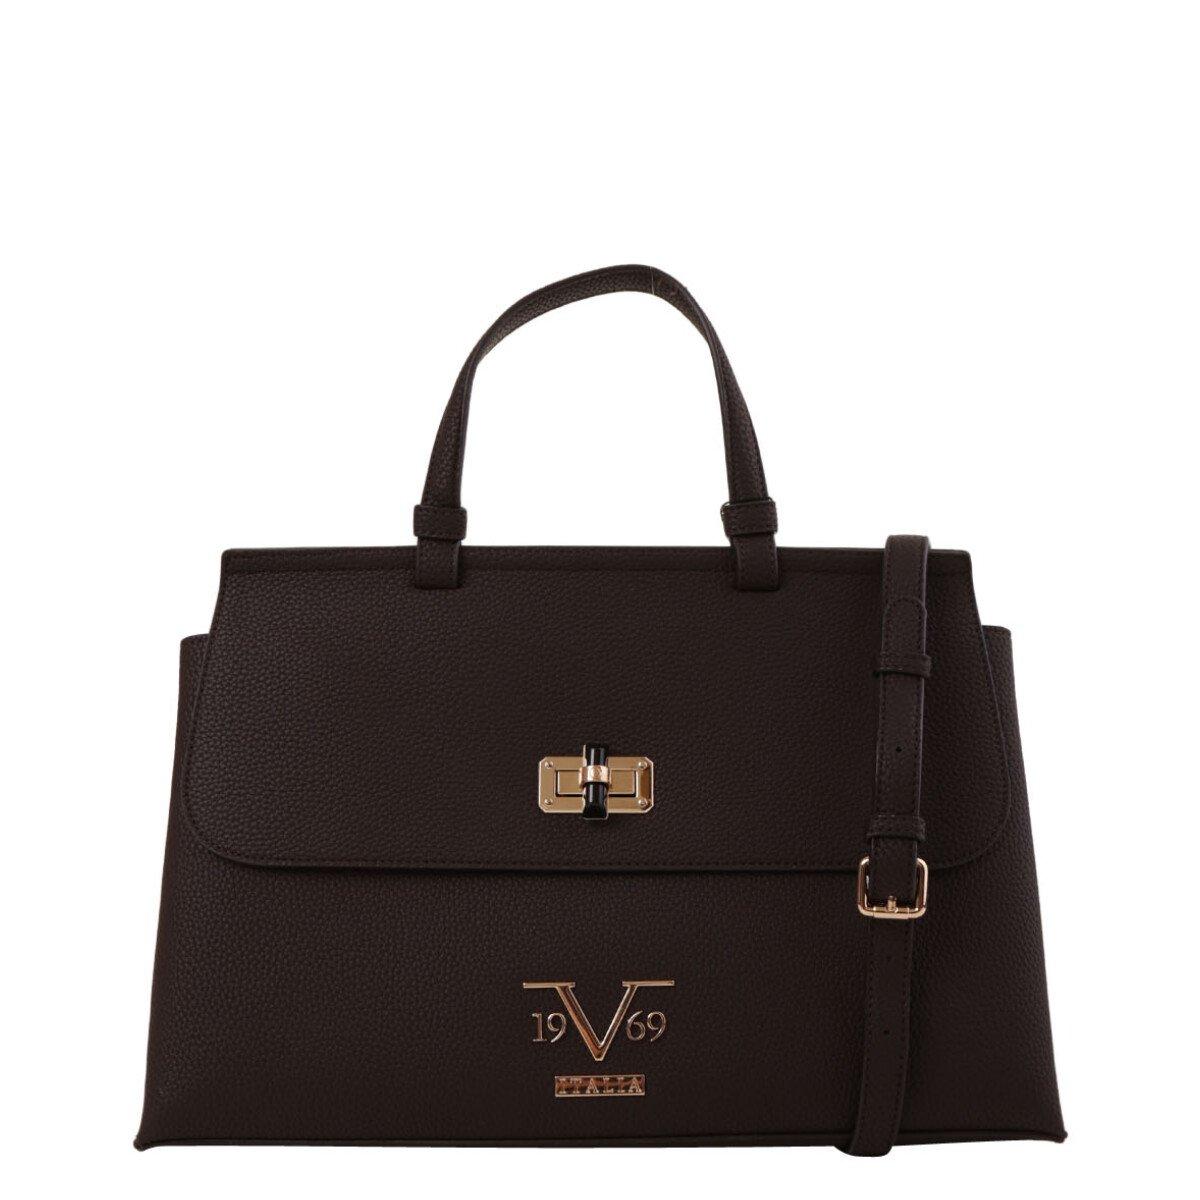 19v69 Italia Women's Handbag Various Colours 318989 - brown UNICA